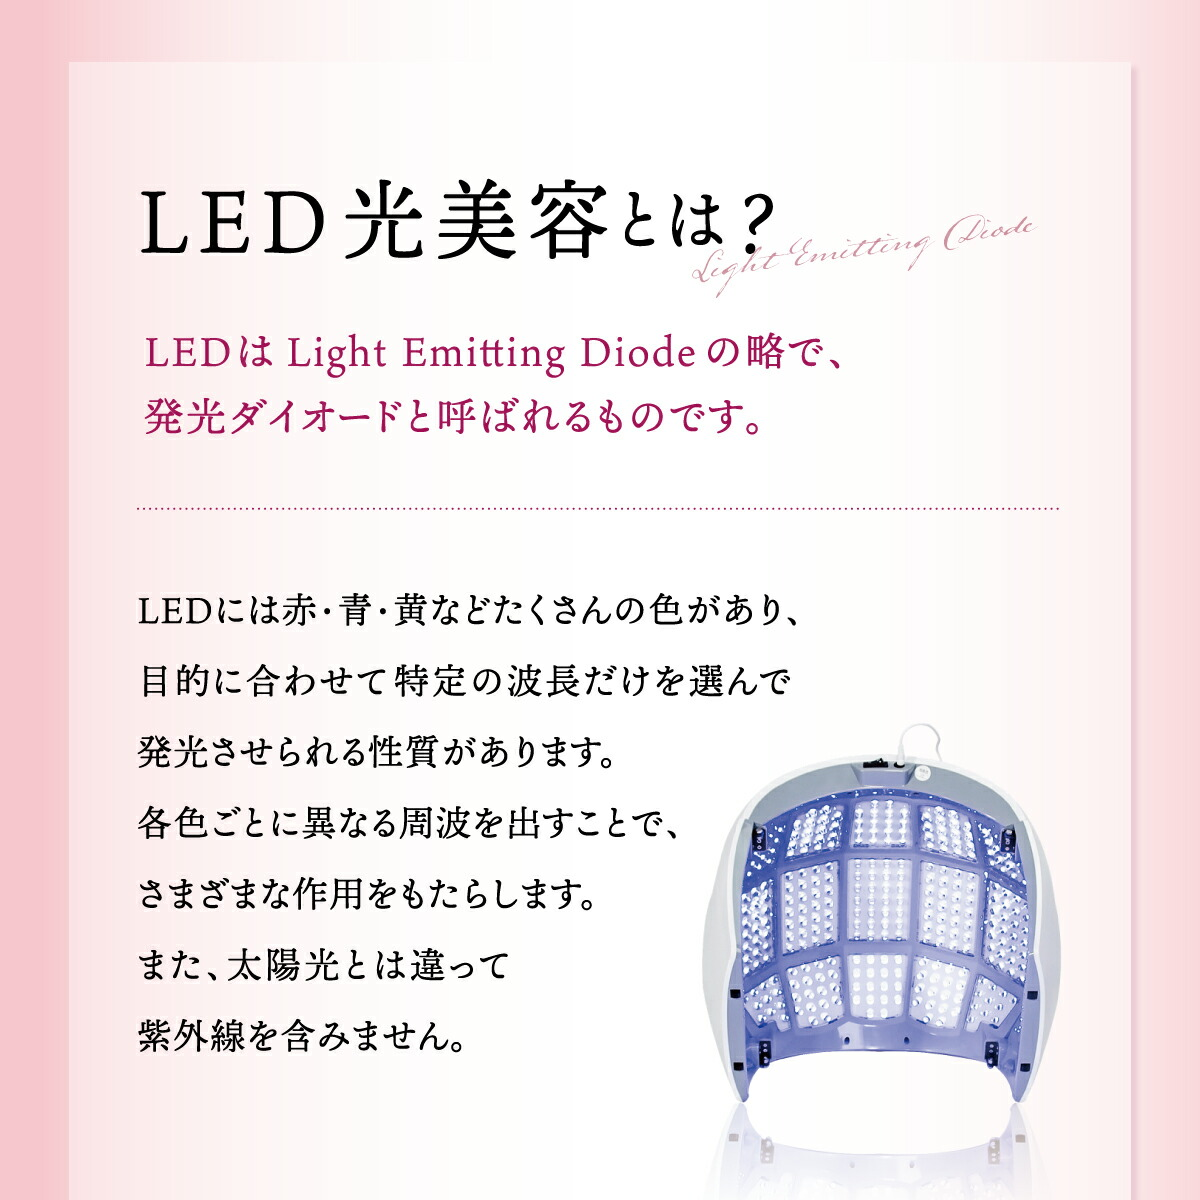 LED美容ライト プレミア